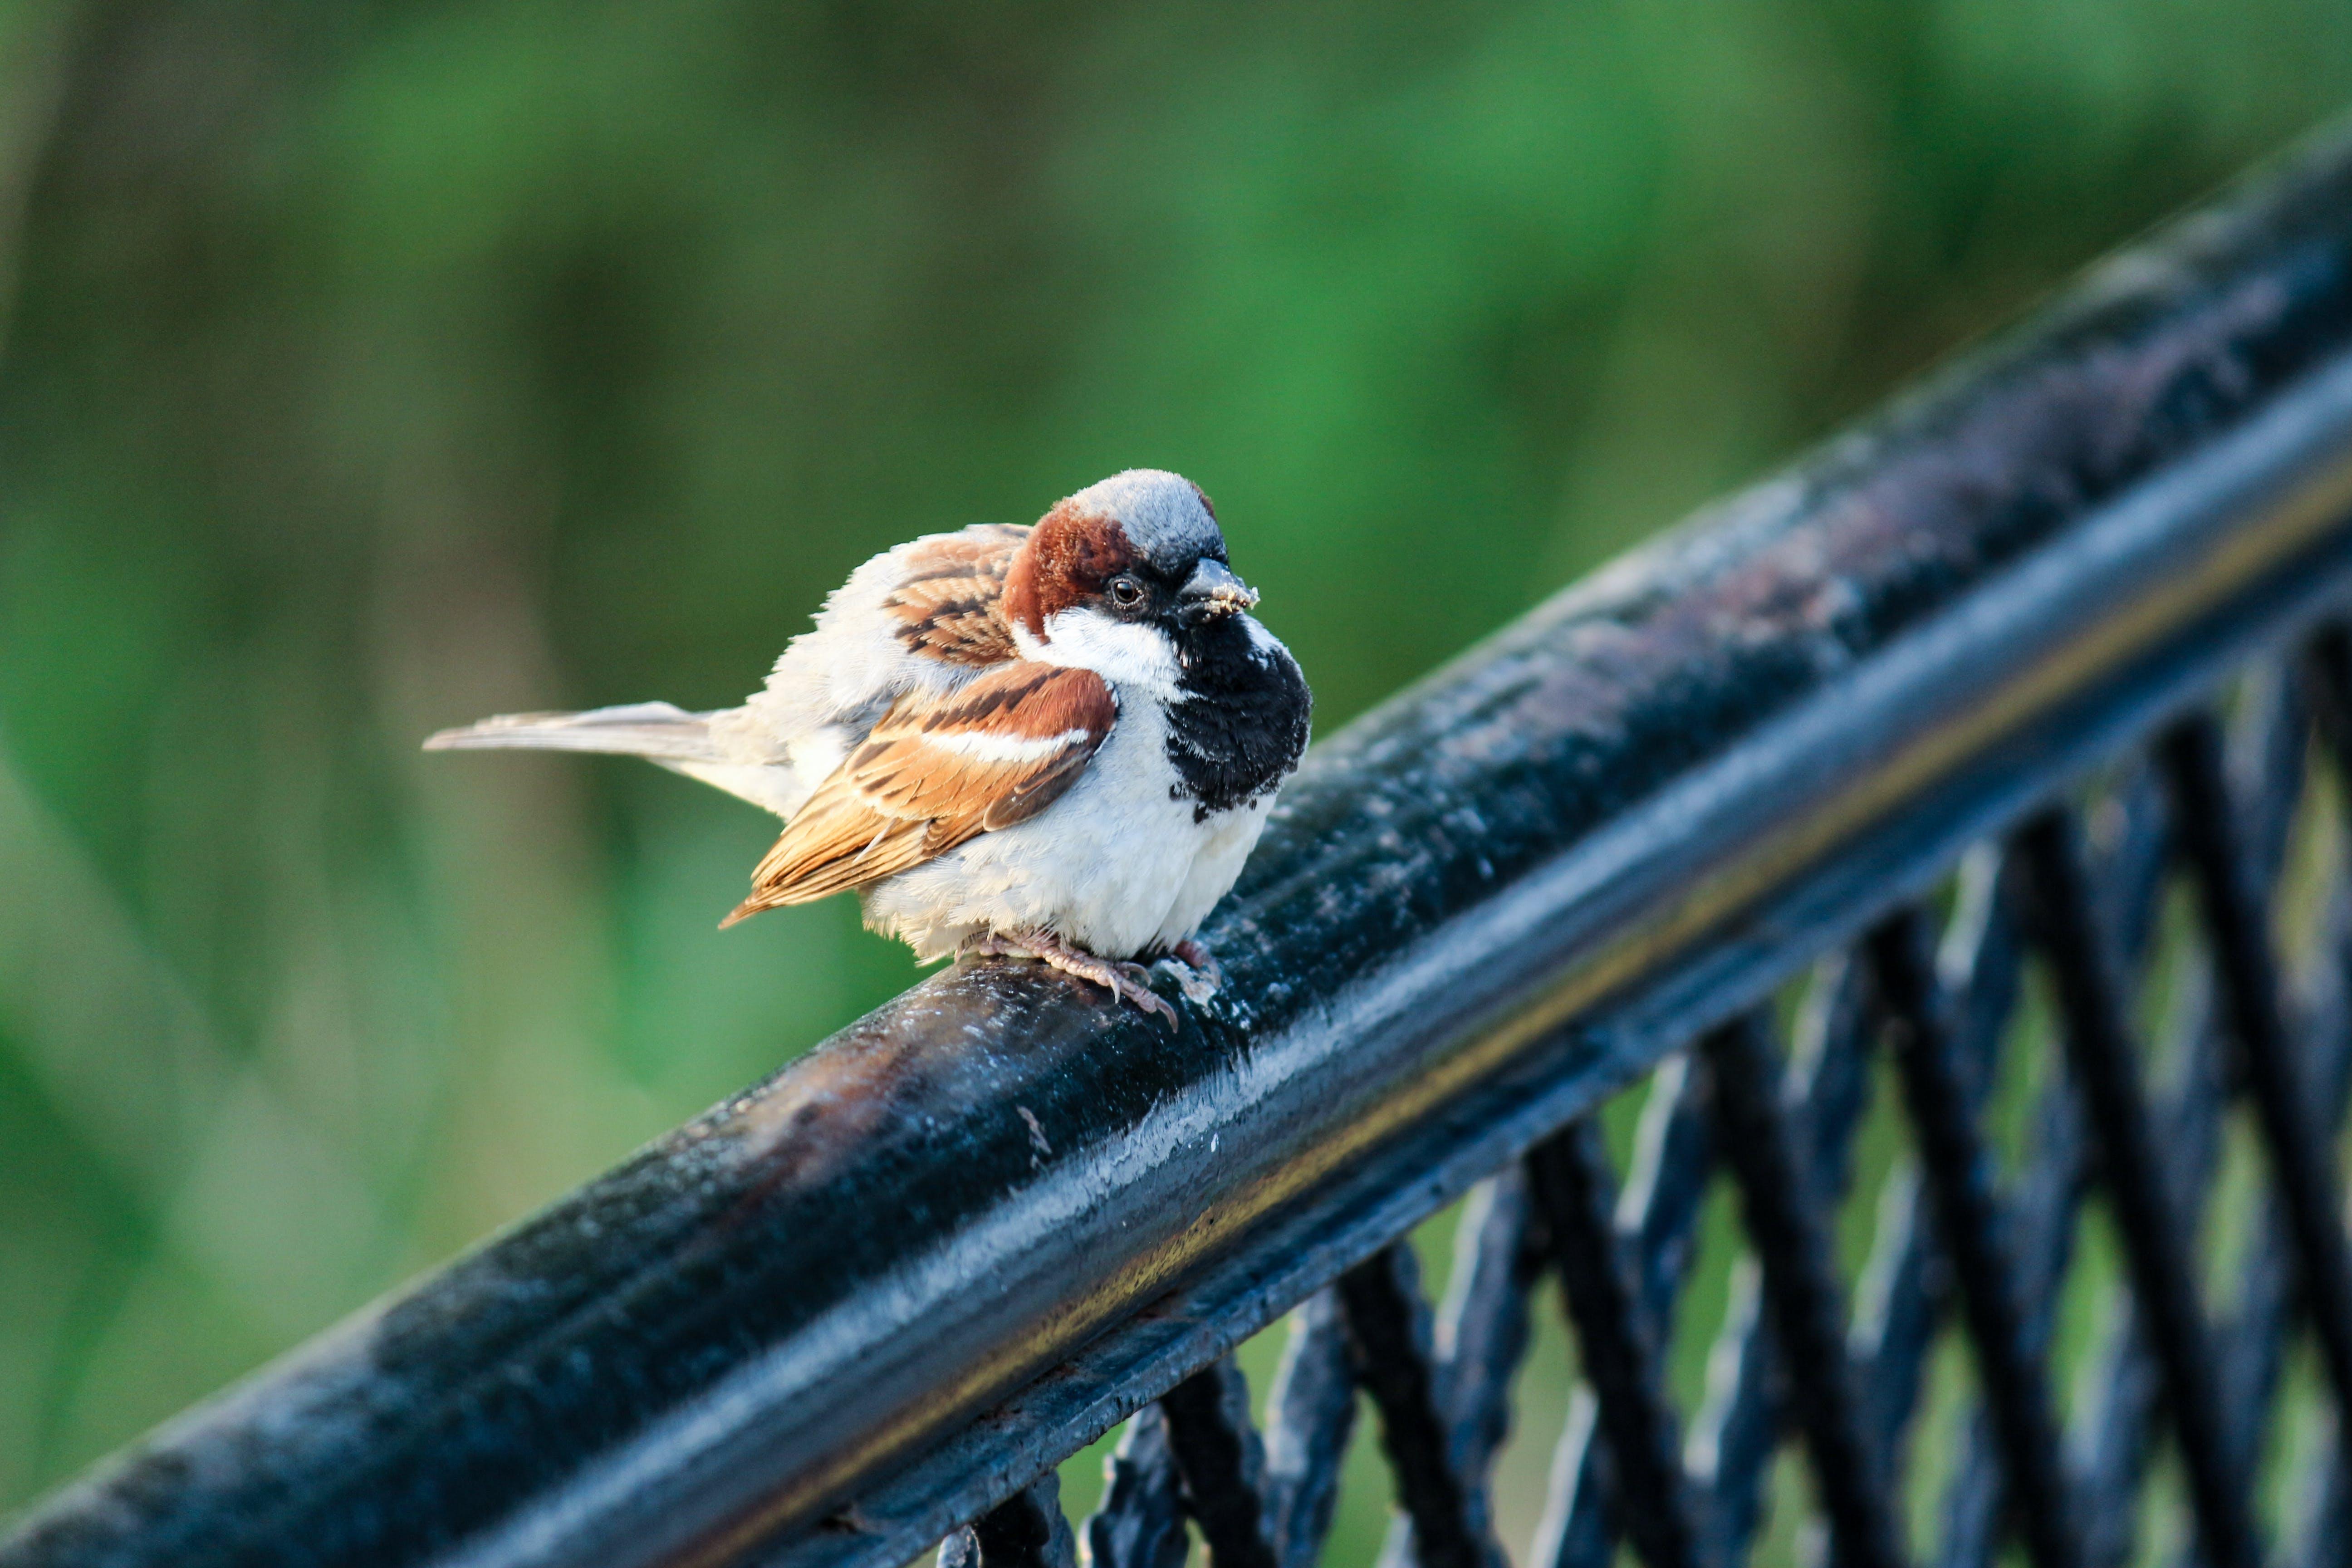 Foto d'estoc gratuïta de #animals #babies #wild #nest #birdfeeder #bird #pho, #naturesbeaty #naturehippys #birdsofinstagram #pre, #sparrows #birdhouse